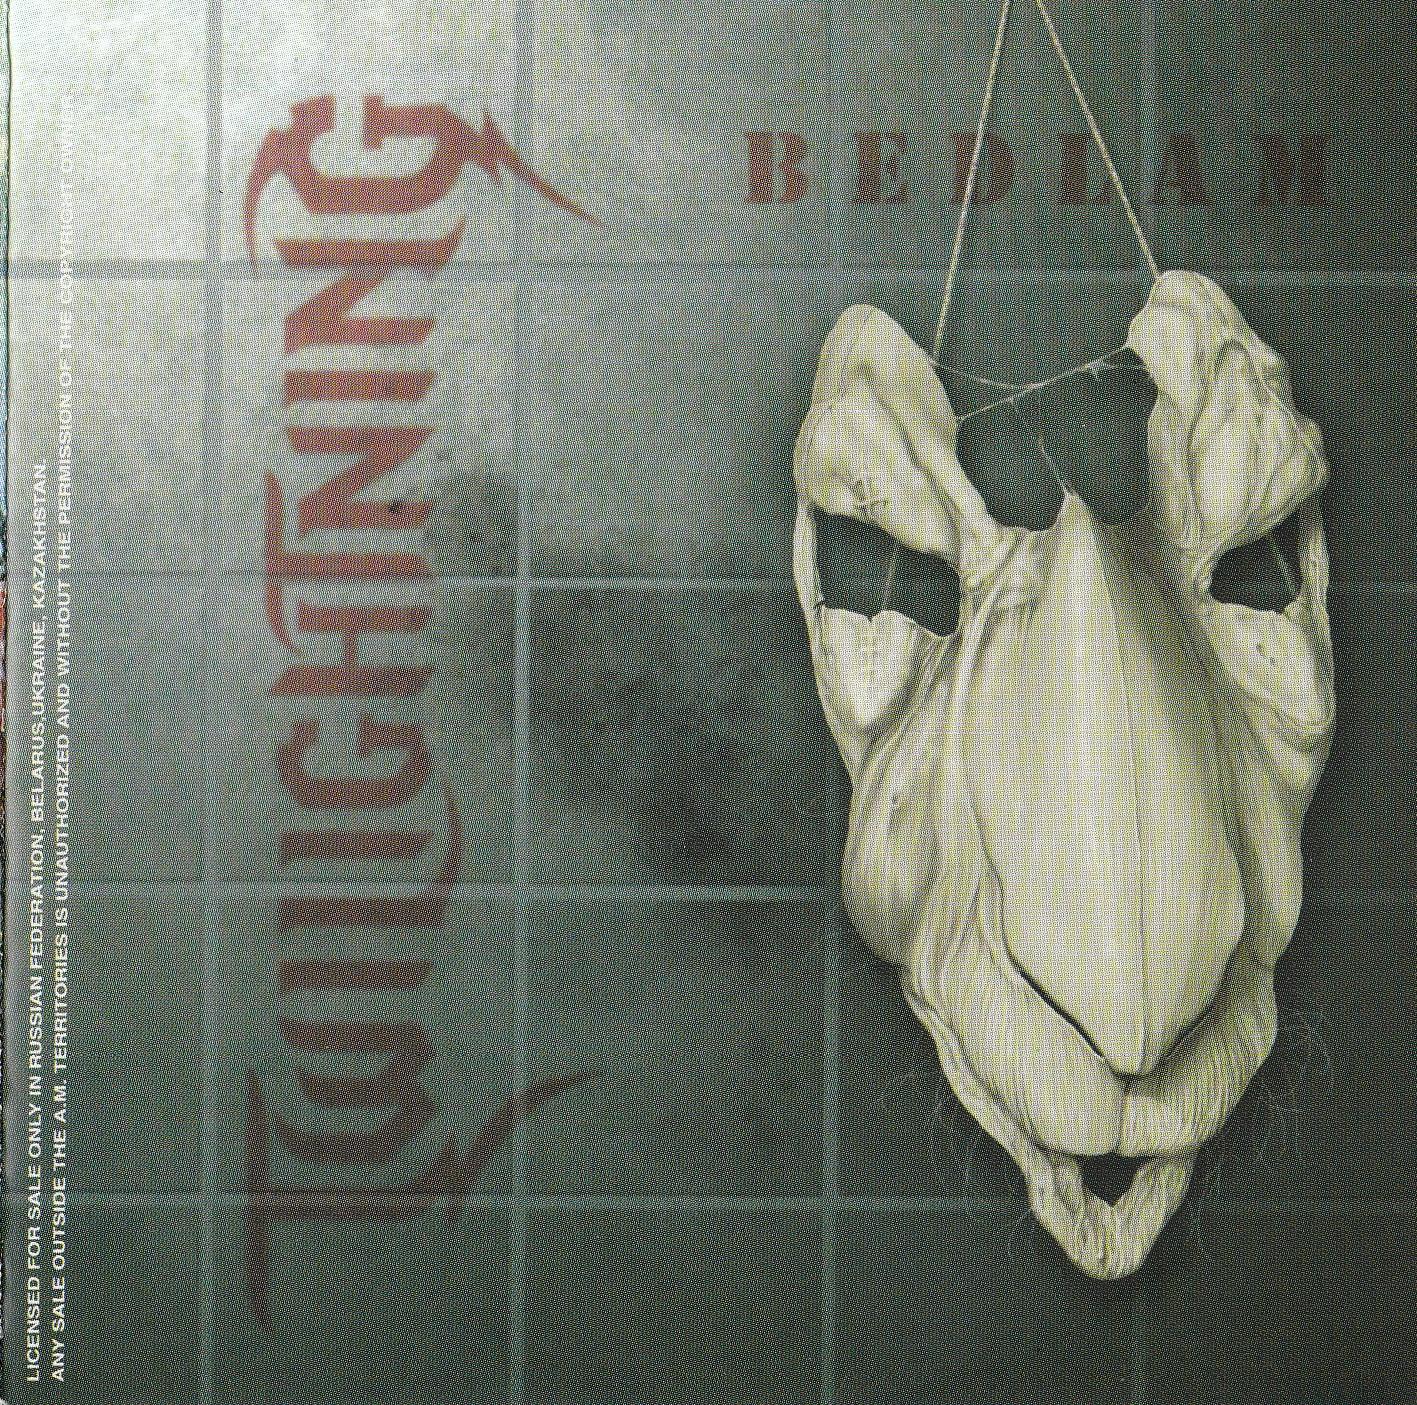 Twilightning — Bedlam EP (2006)